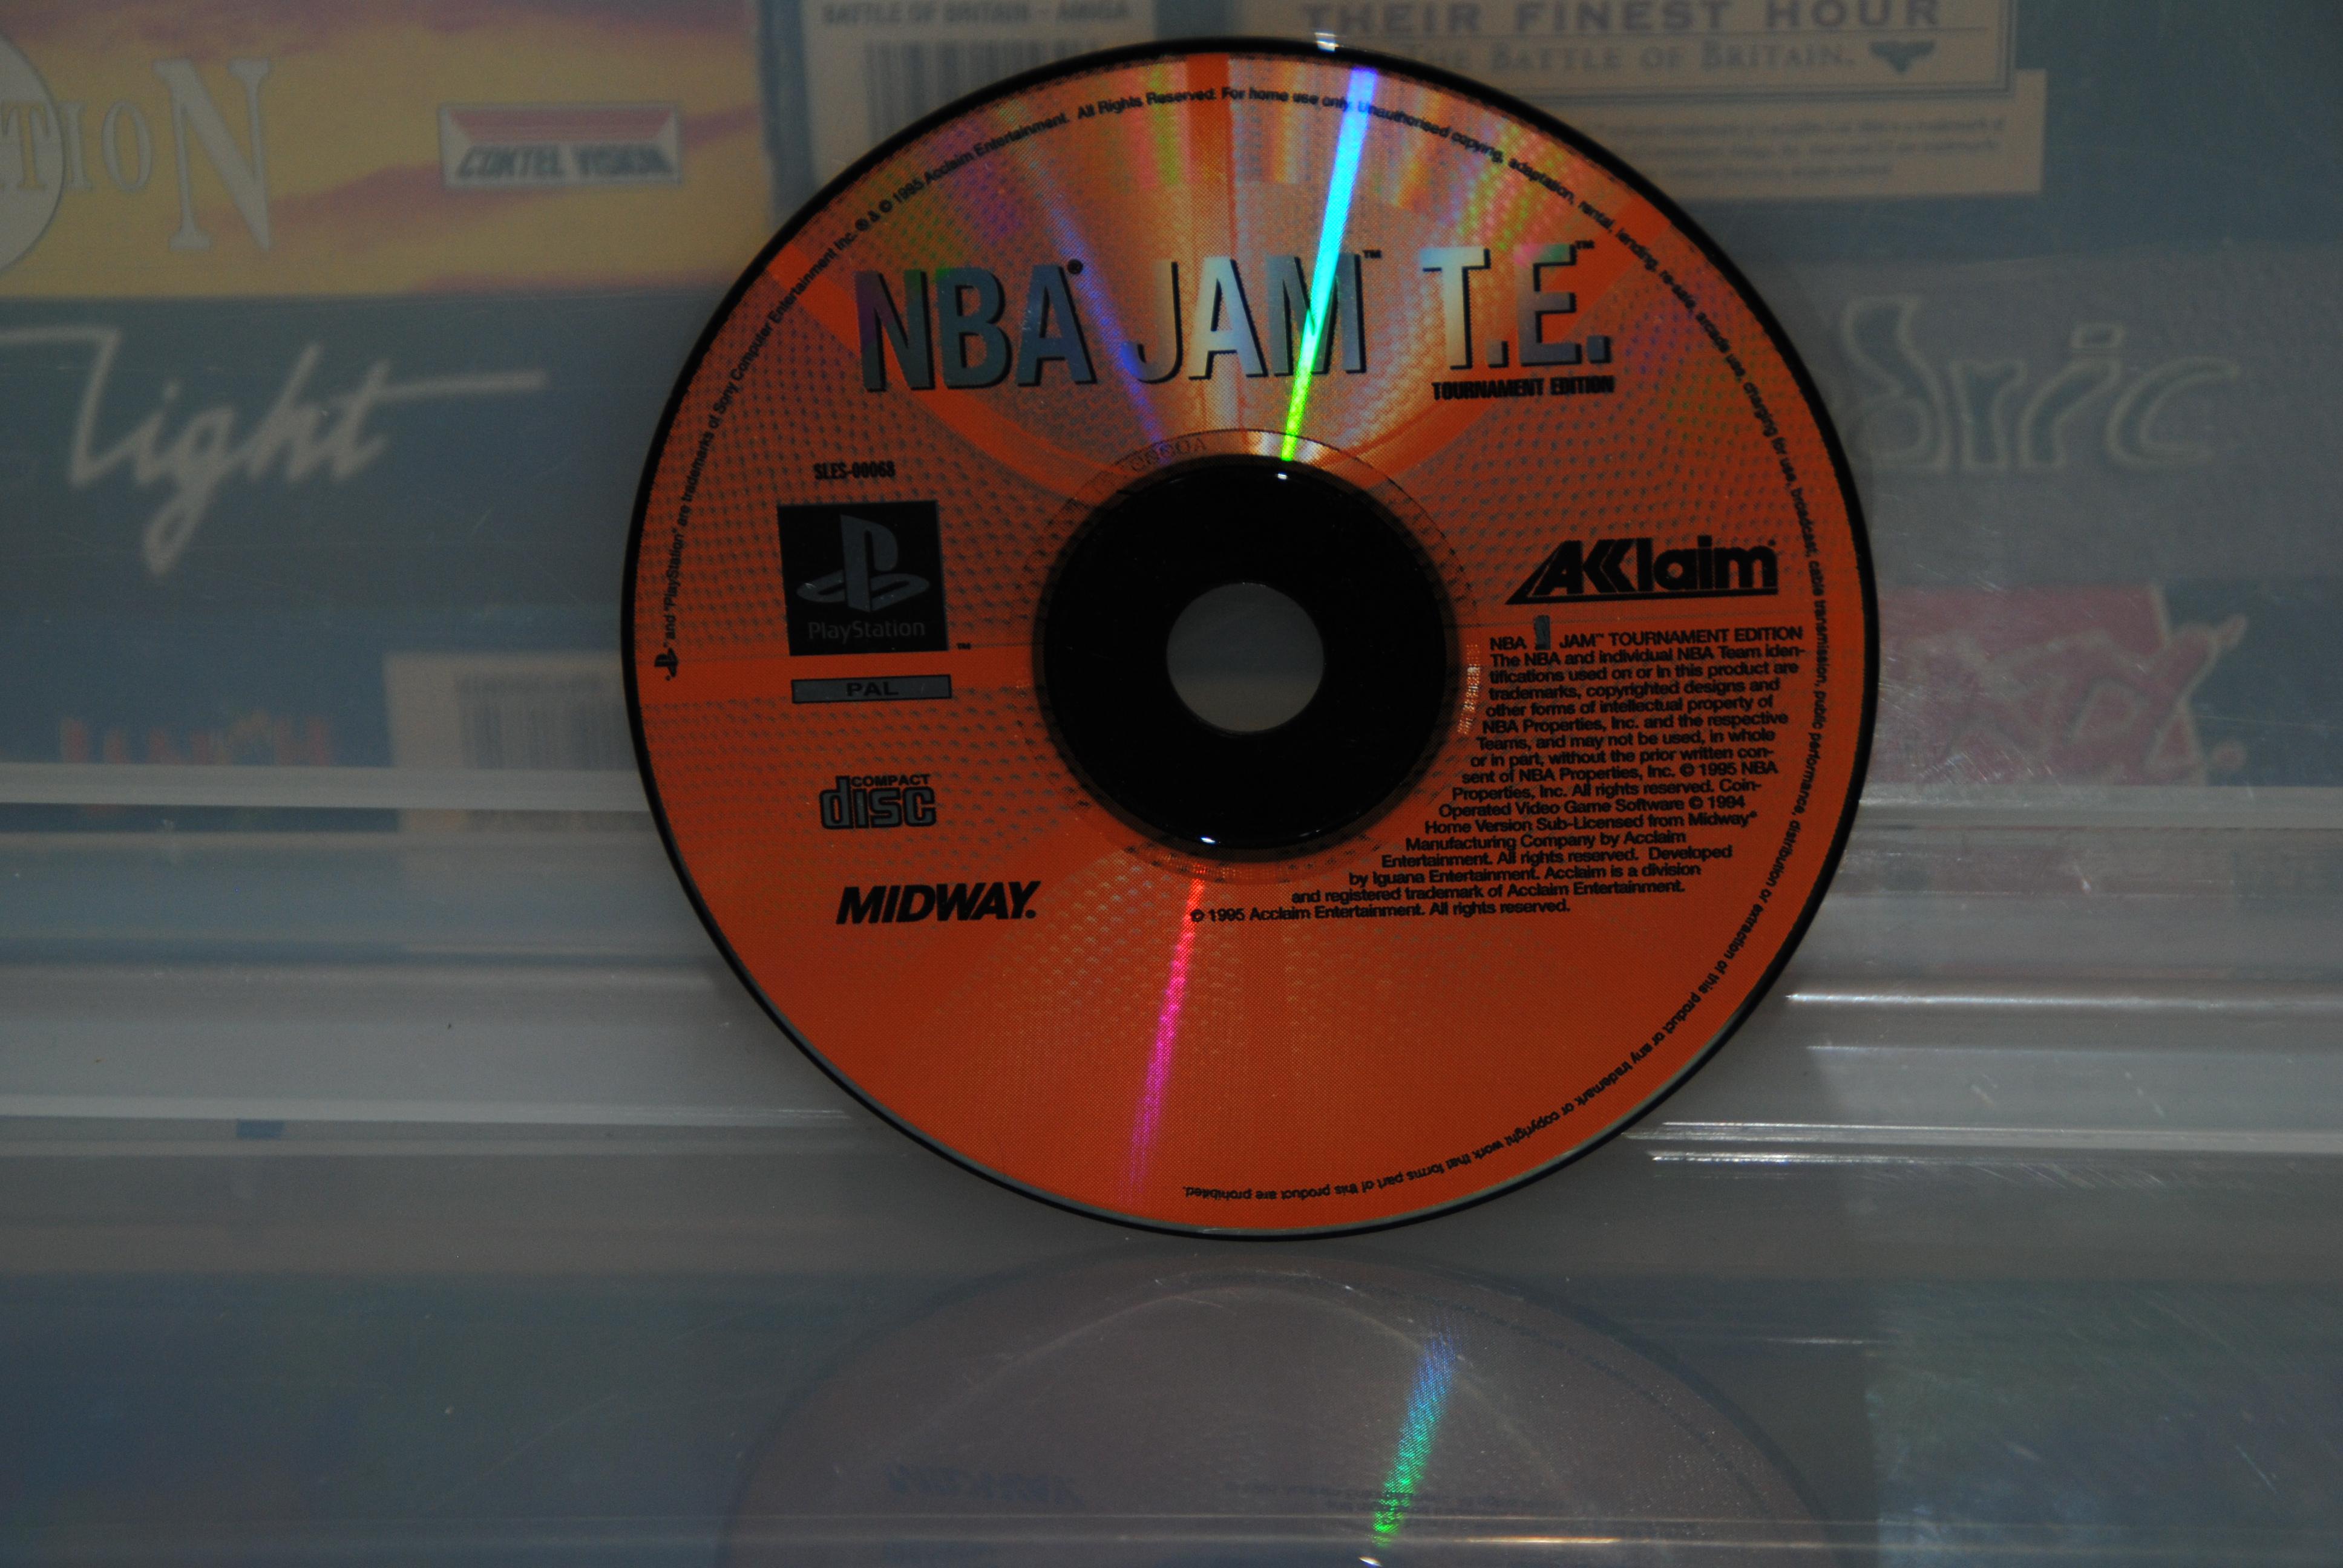 NBA JAM T.E CD - Acclaim